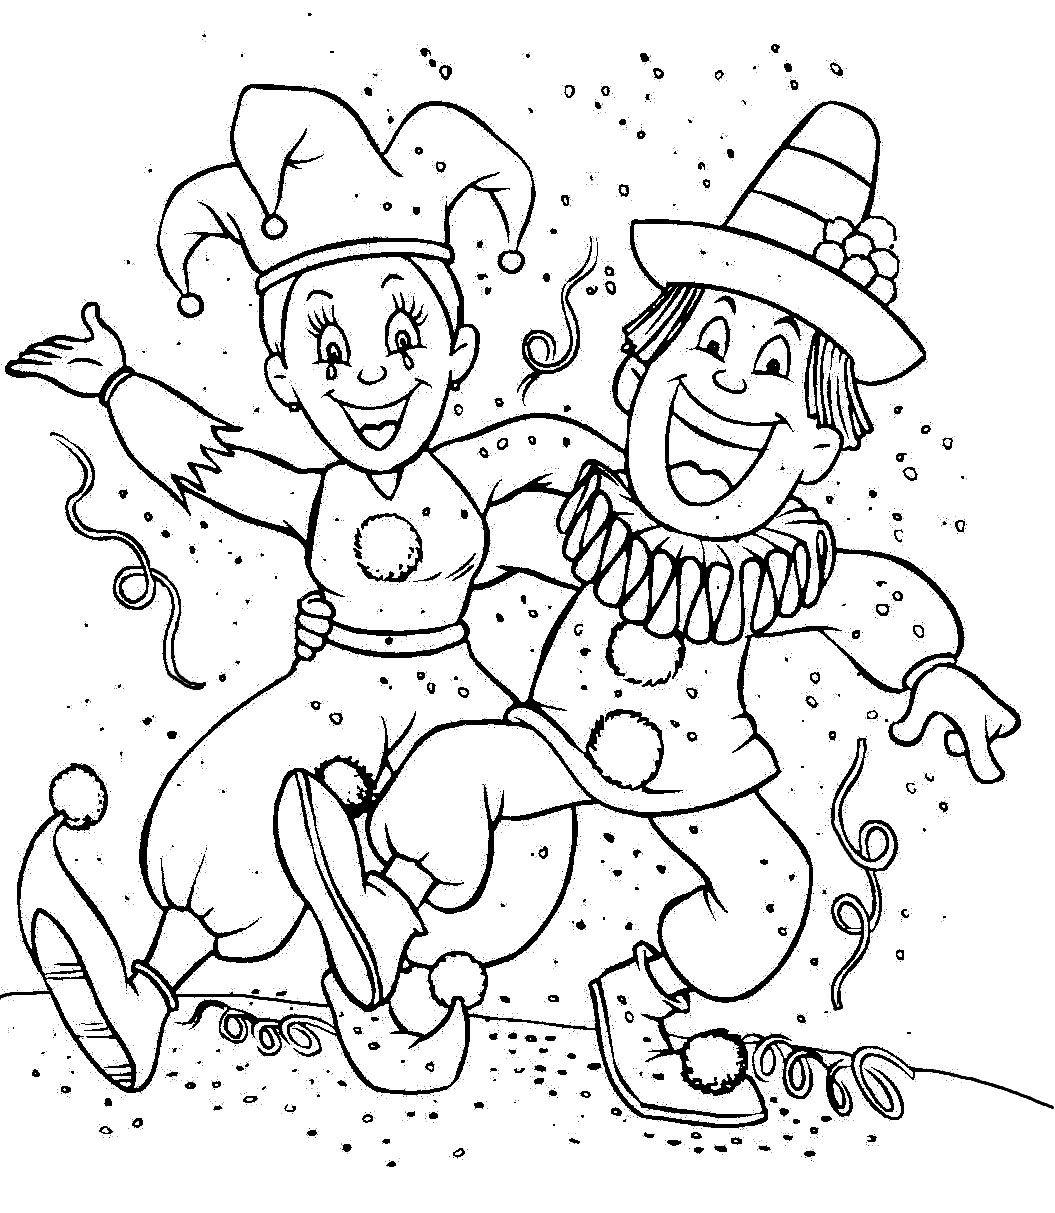 Afbeeldingsresultaat Voor Carnaval Colouring Pages Carnaval Thema Carnaval Kleurplaten